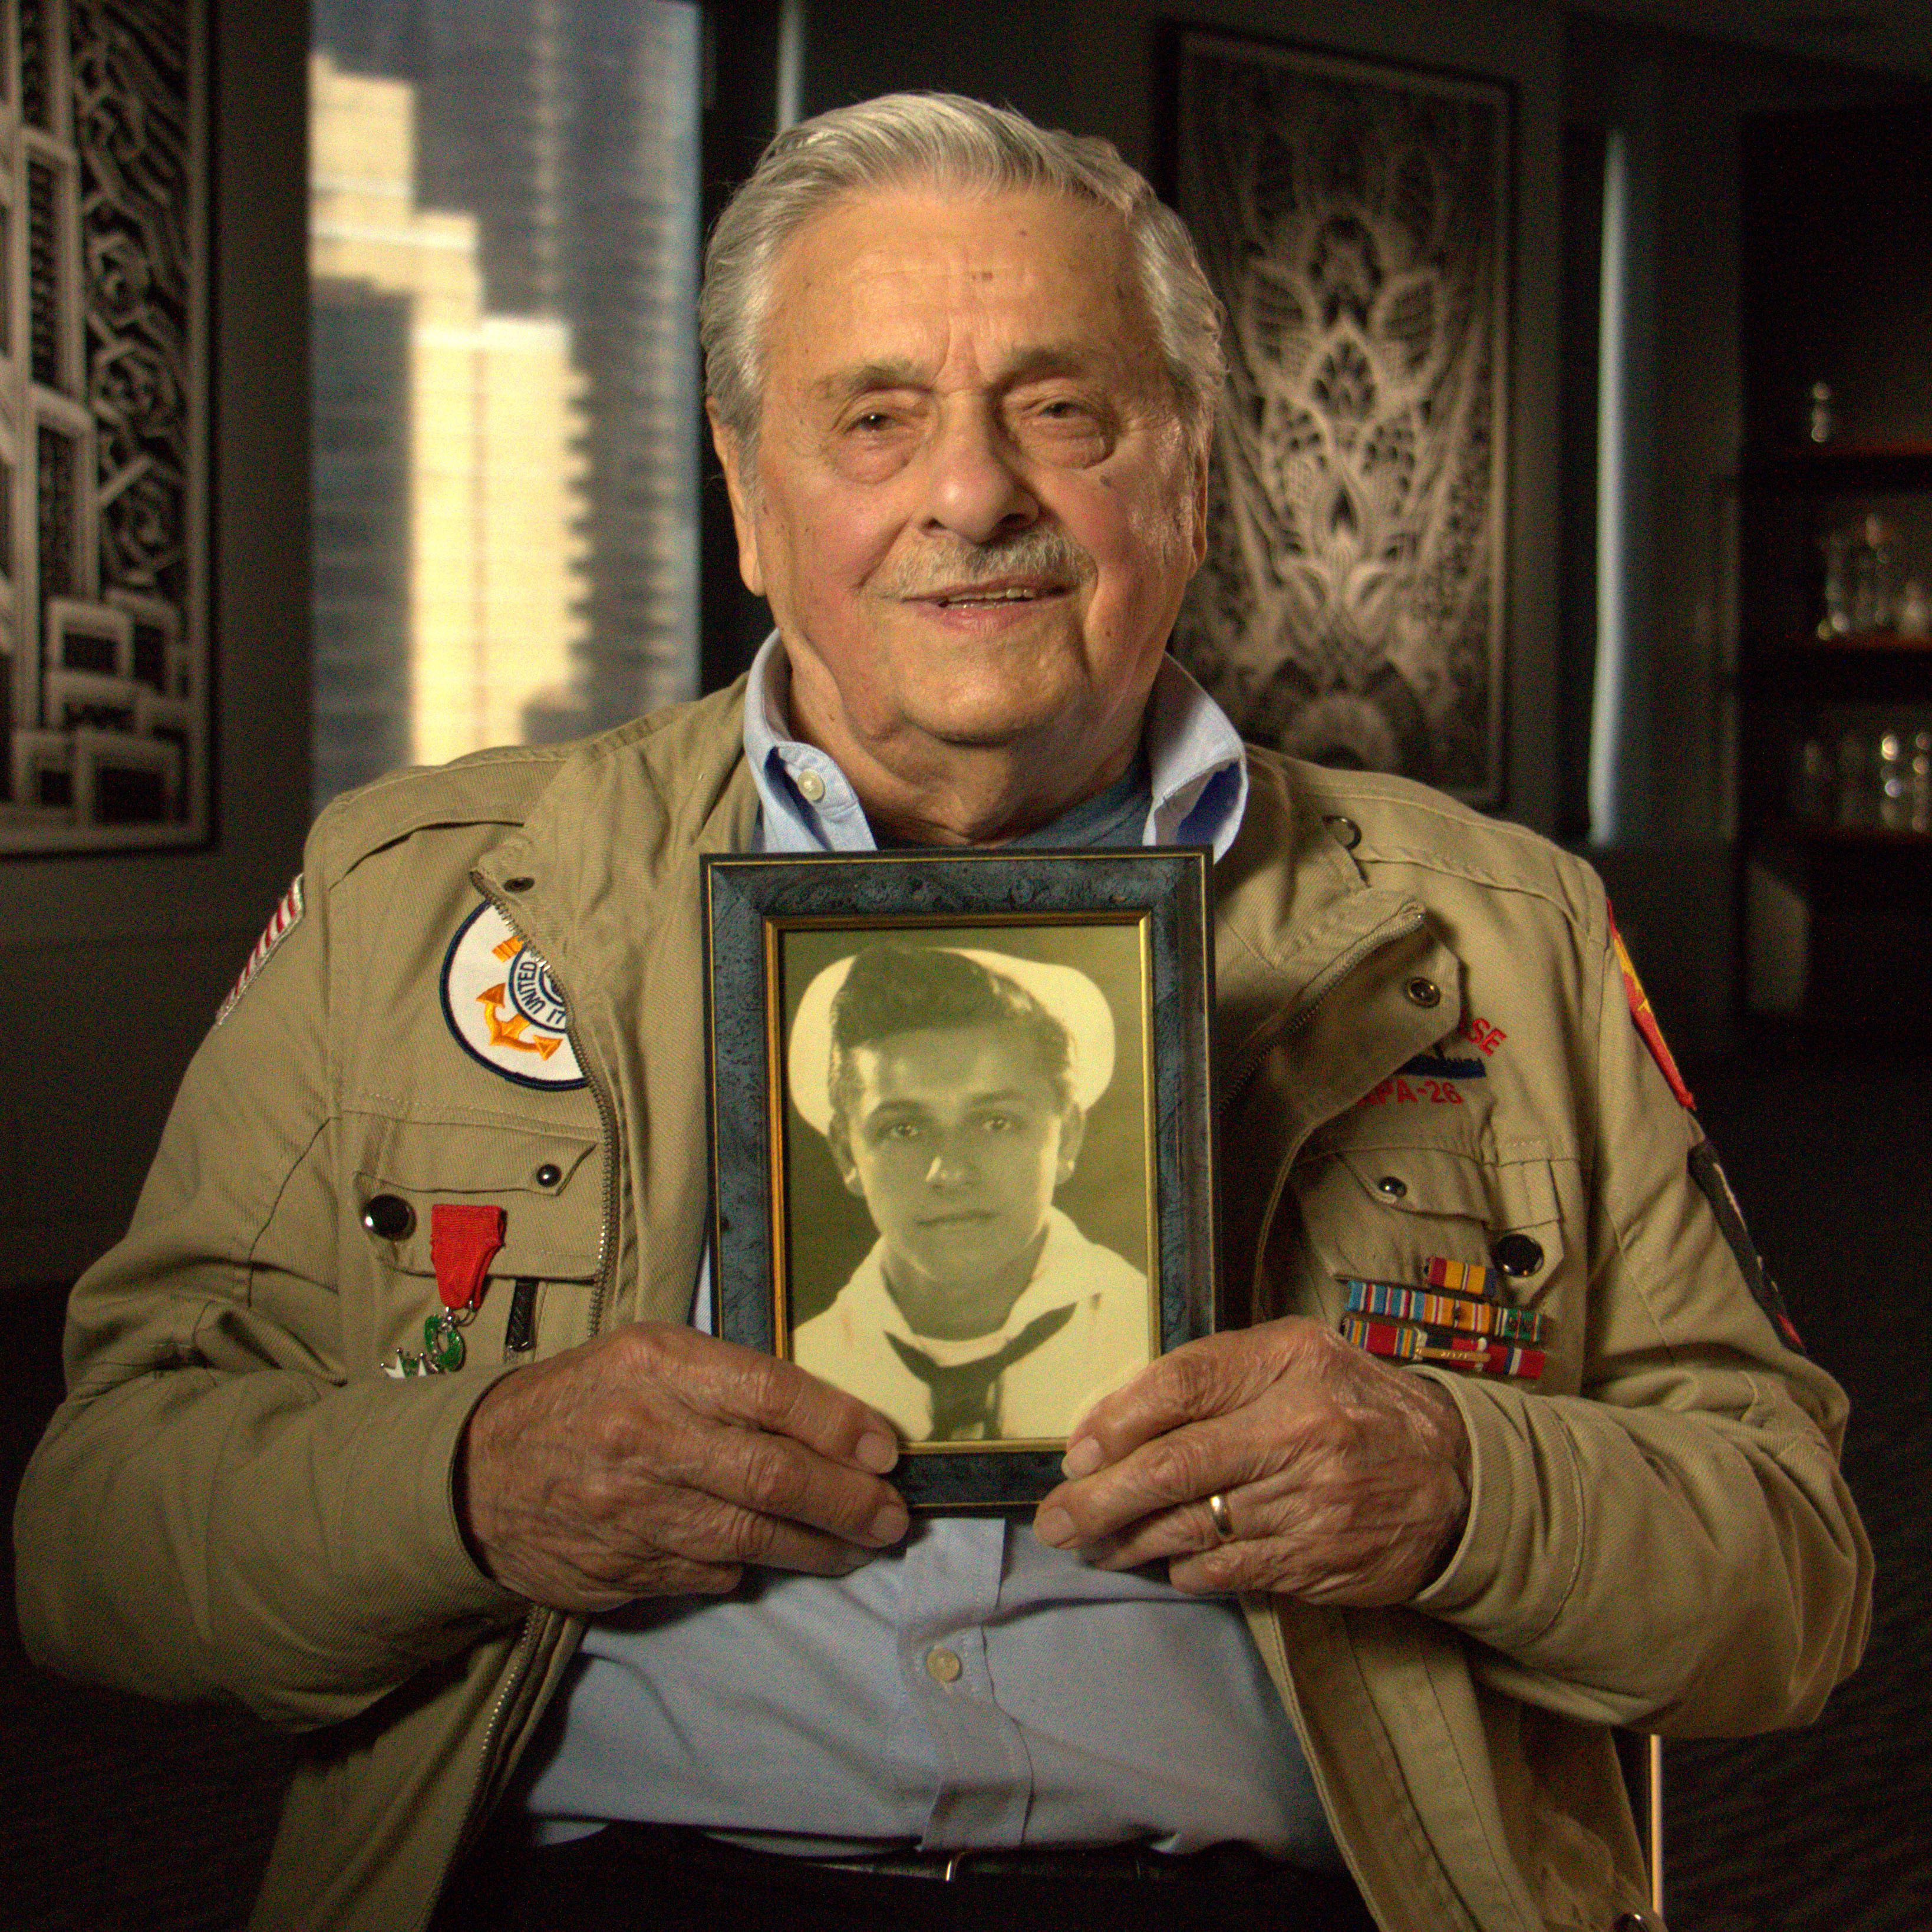 Caption: Frank DeVita, veteran of the U.S. Coast Guard, holds a picture of himself in uniform when he served in World War II., Credit: Amanda Lalezarian